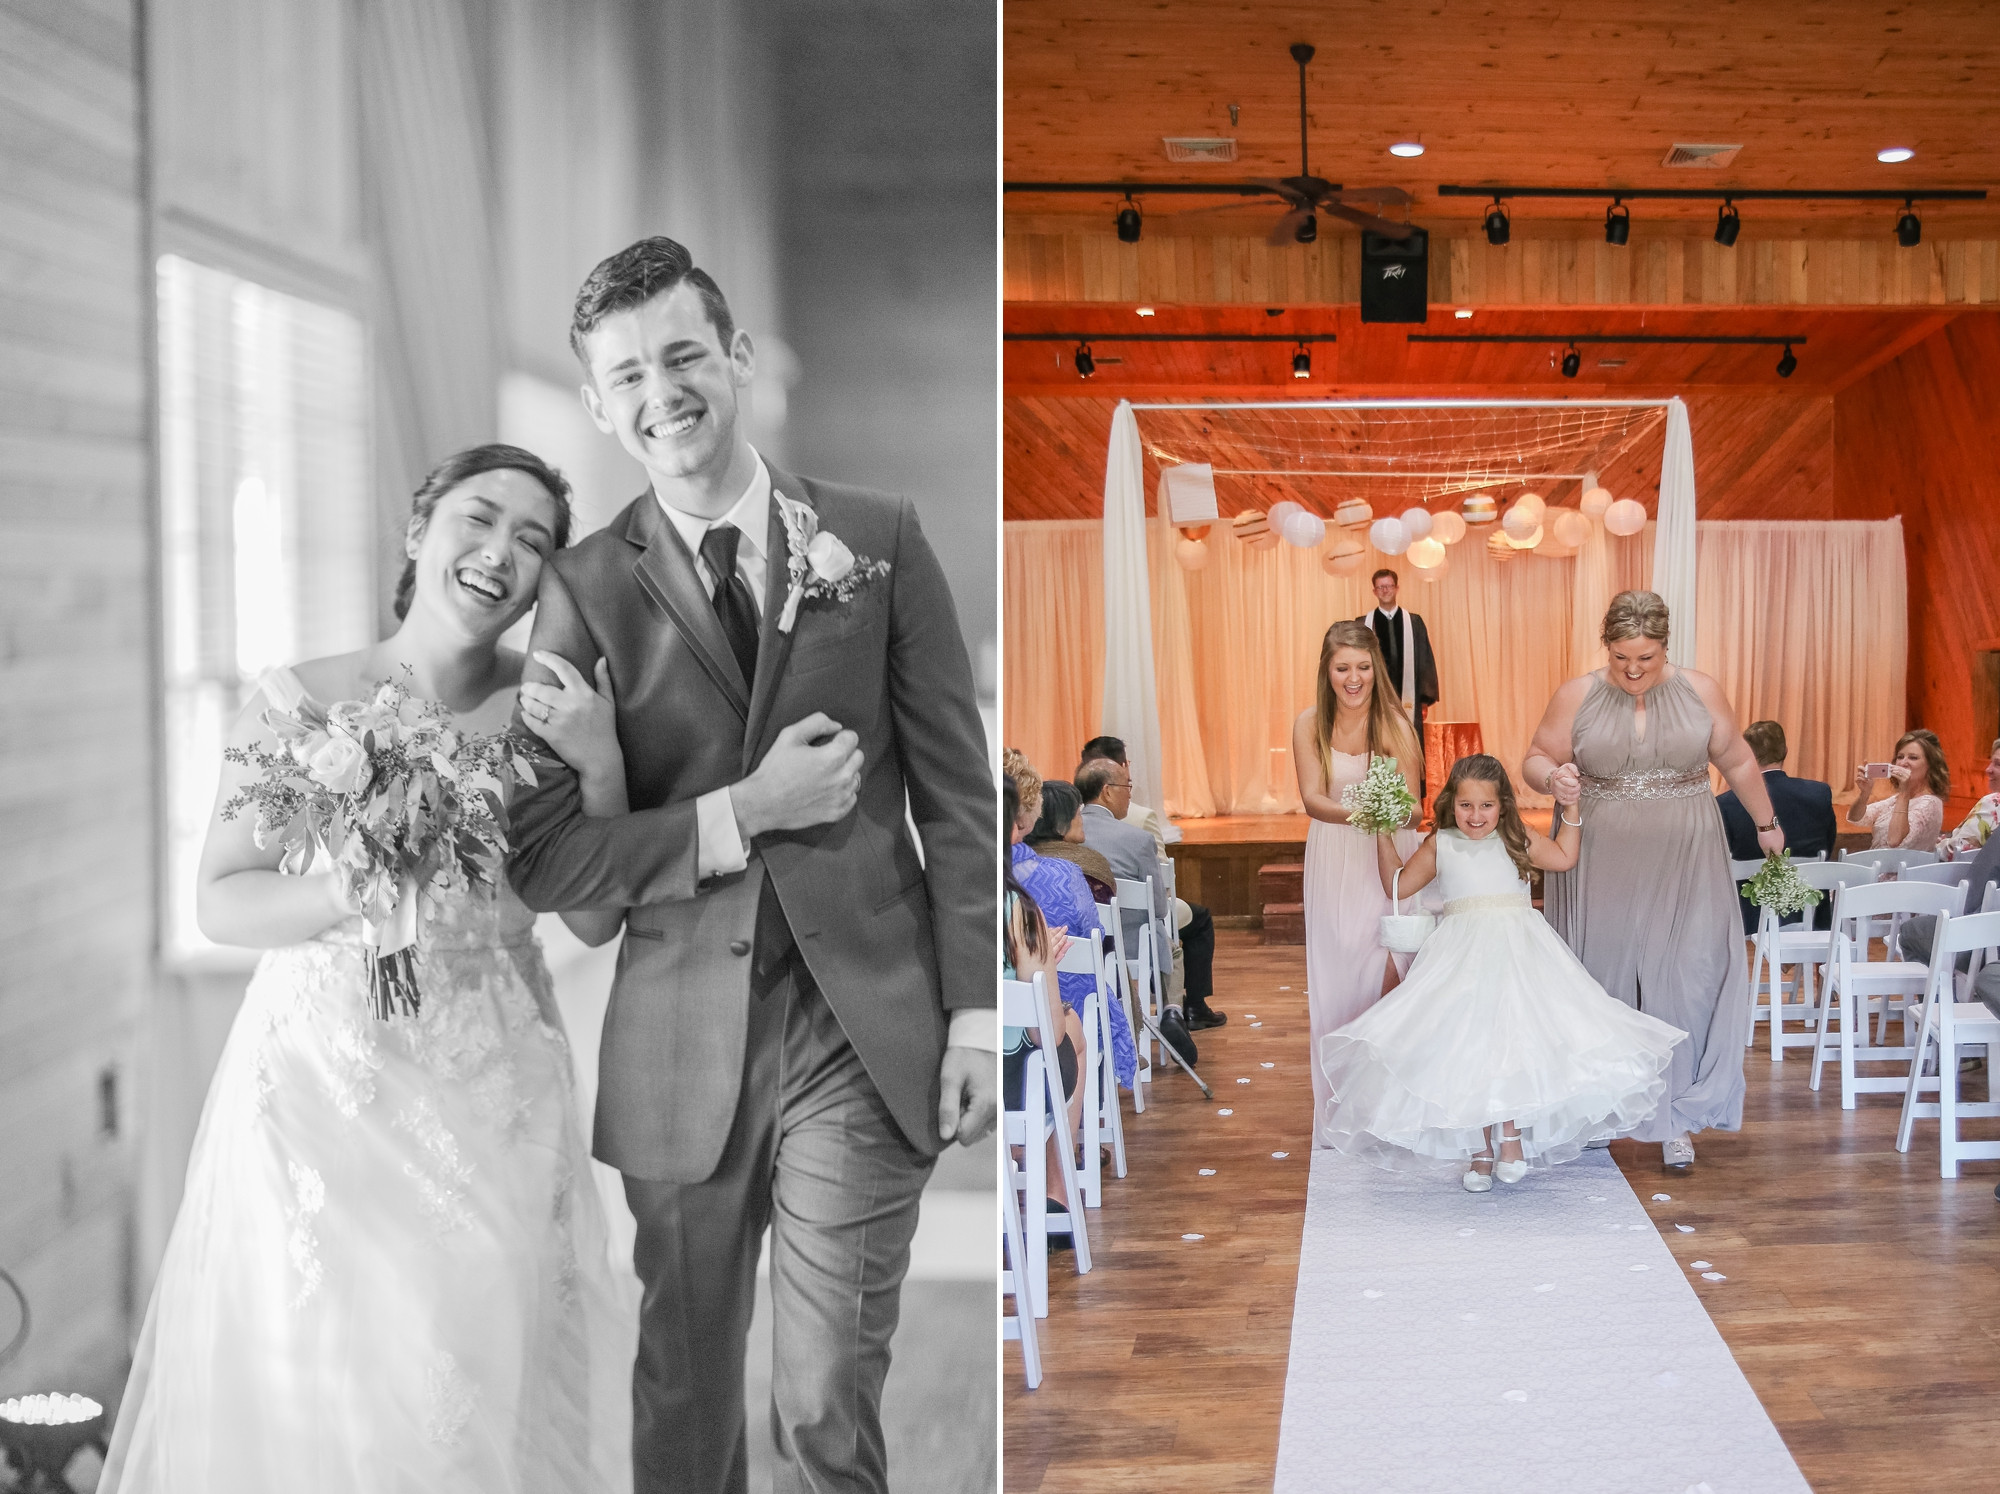 giles wedding blog 25.jpg